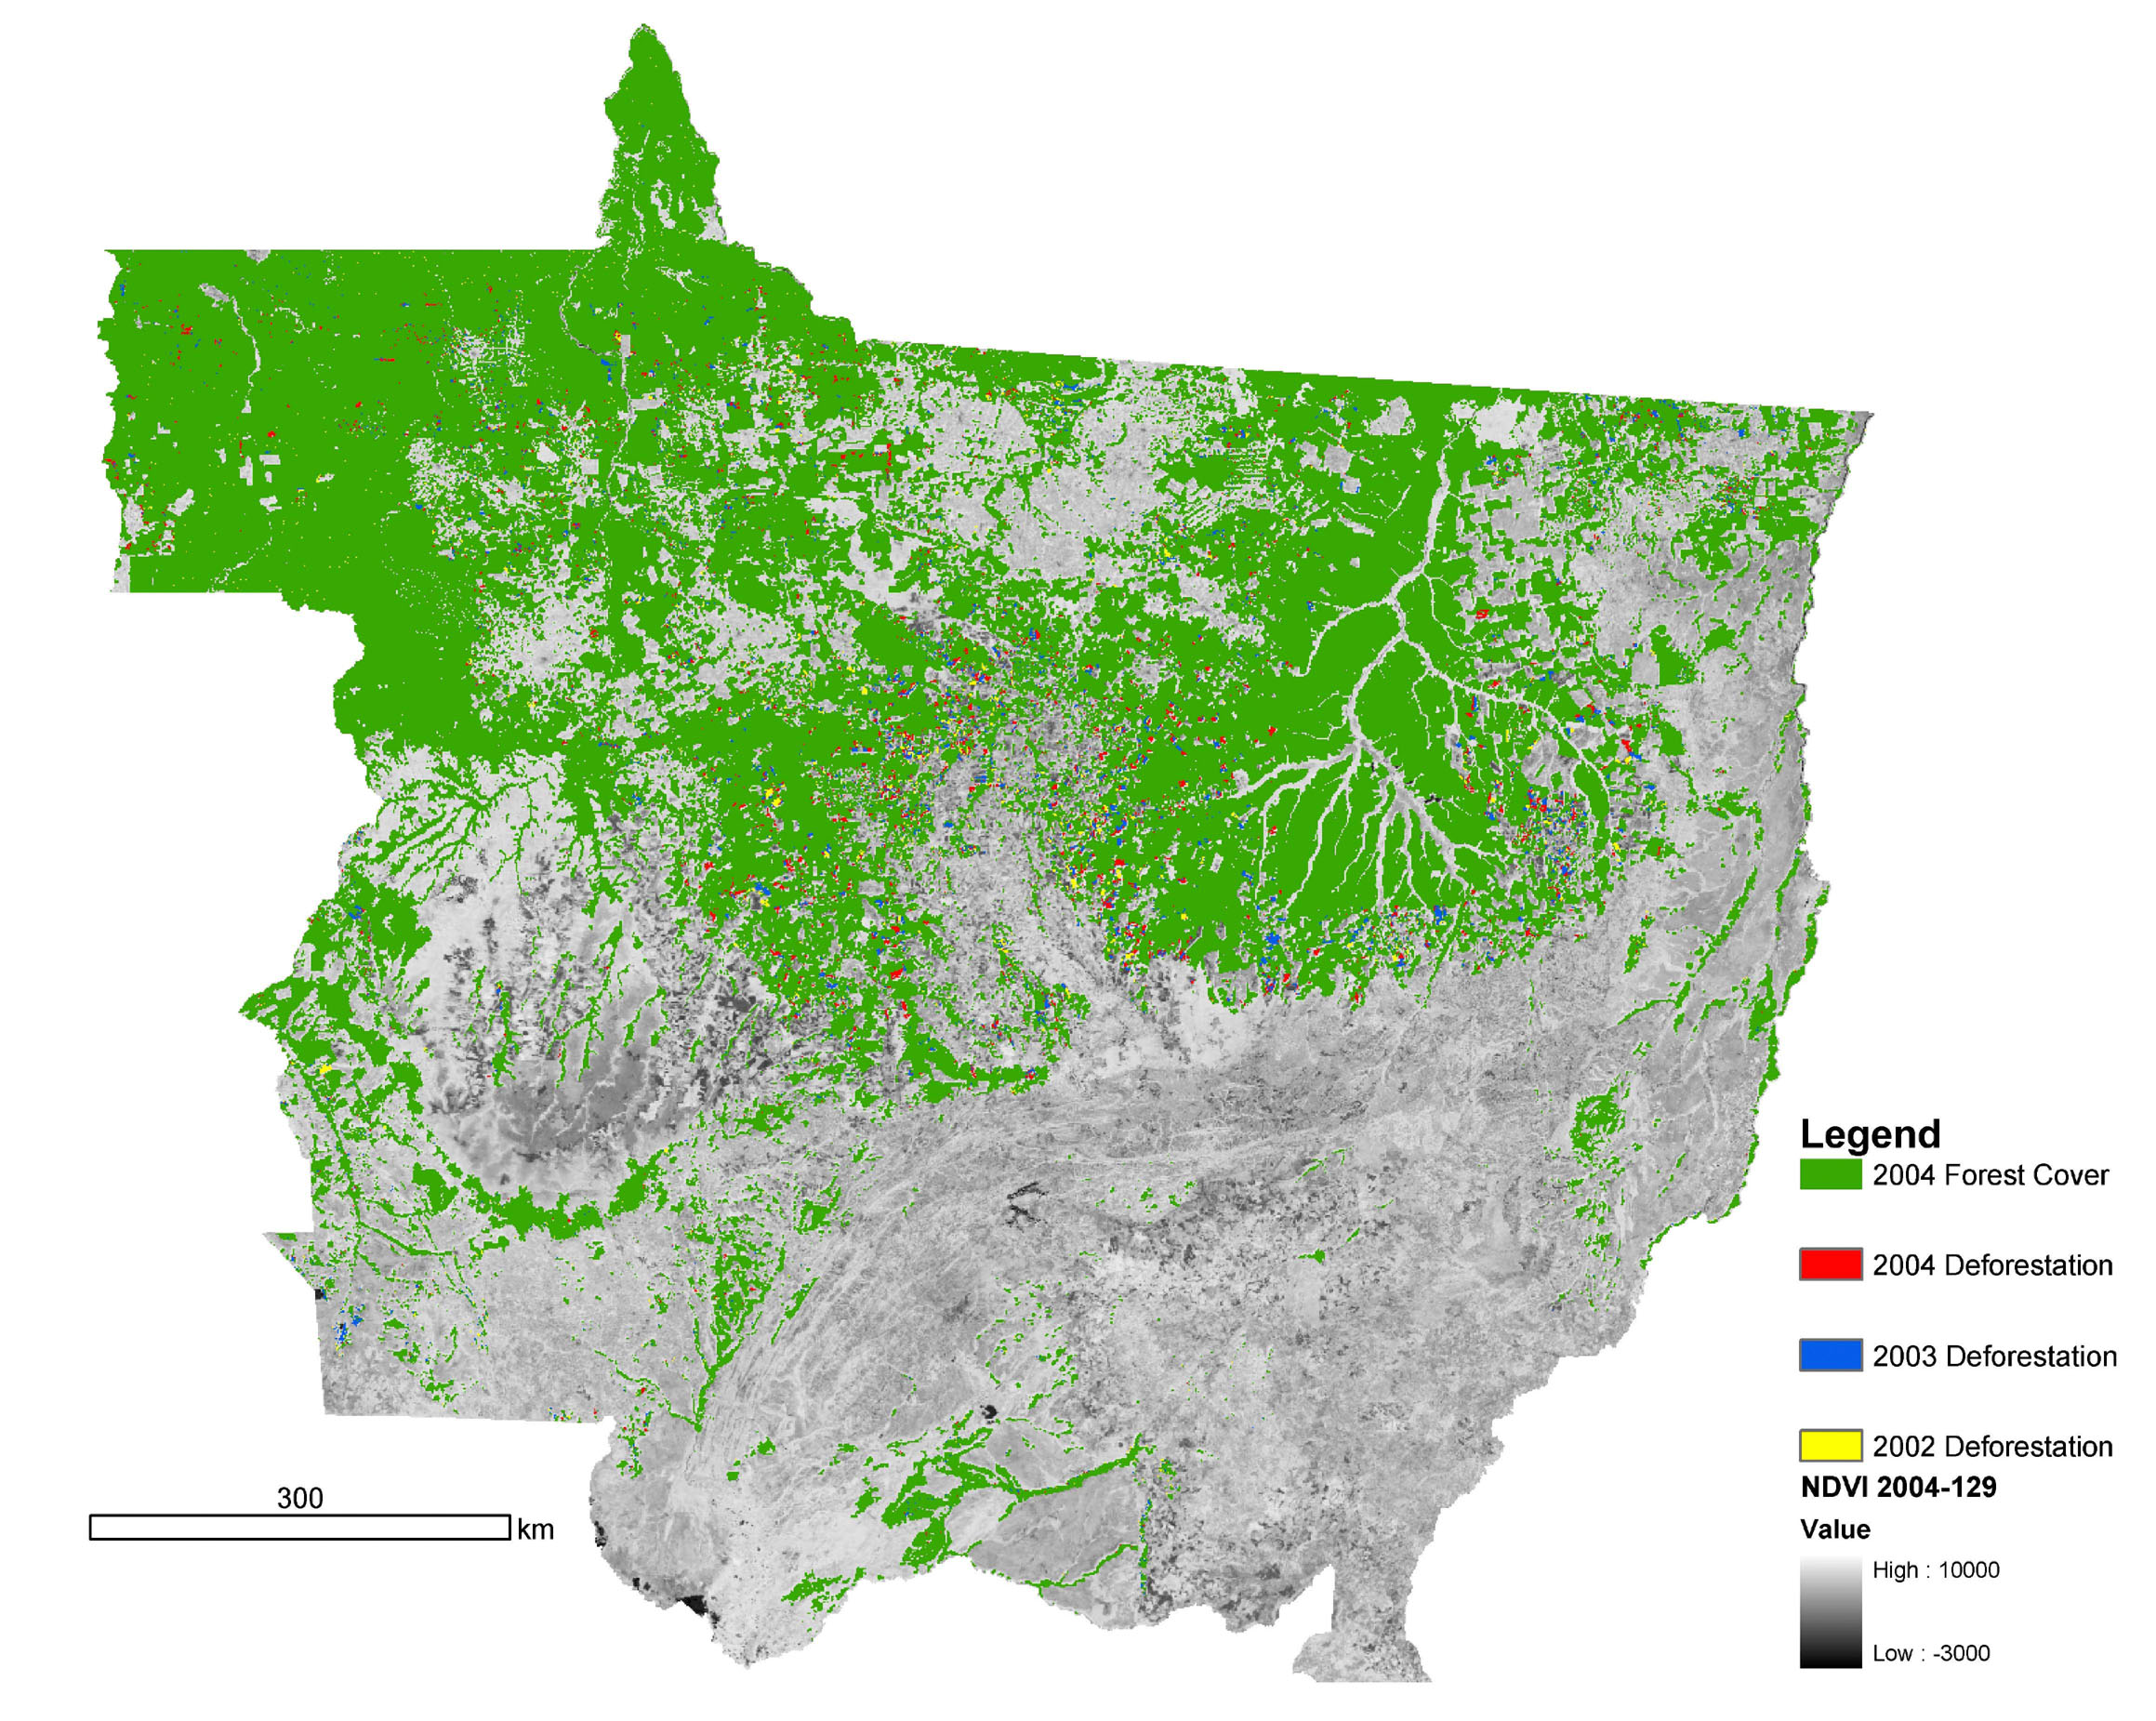 download large image  7 MB  JPEG  2319x1851 Amazon Rainforest Map Deforestation